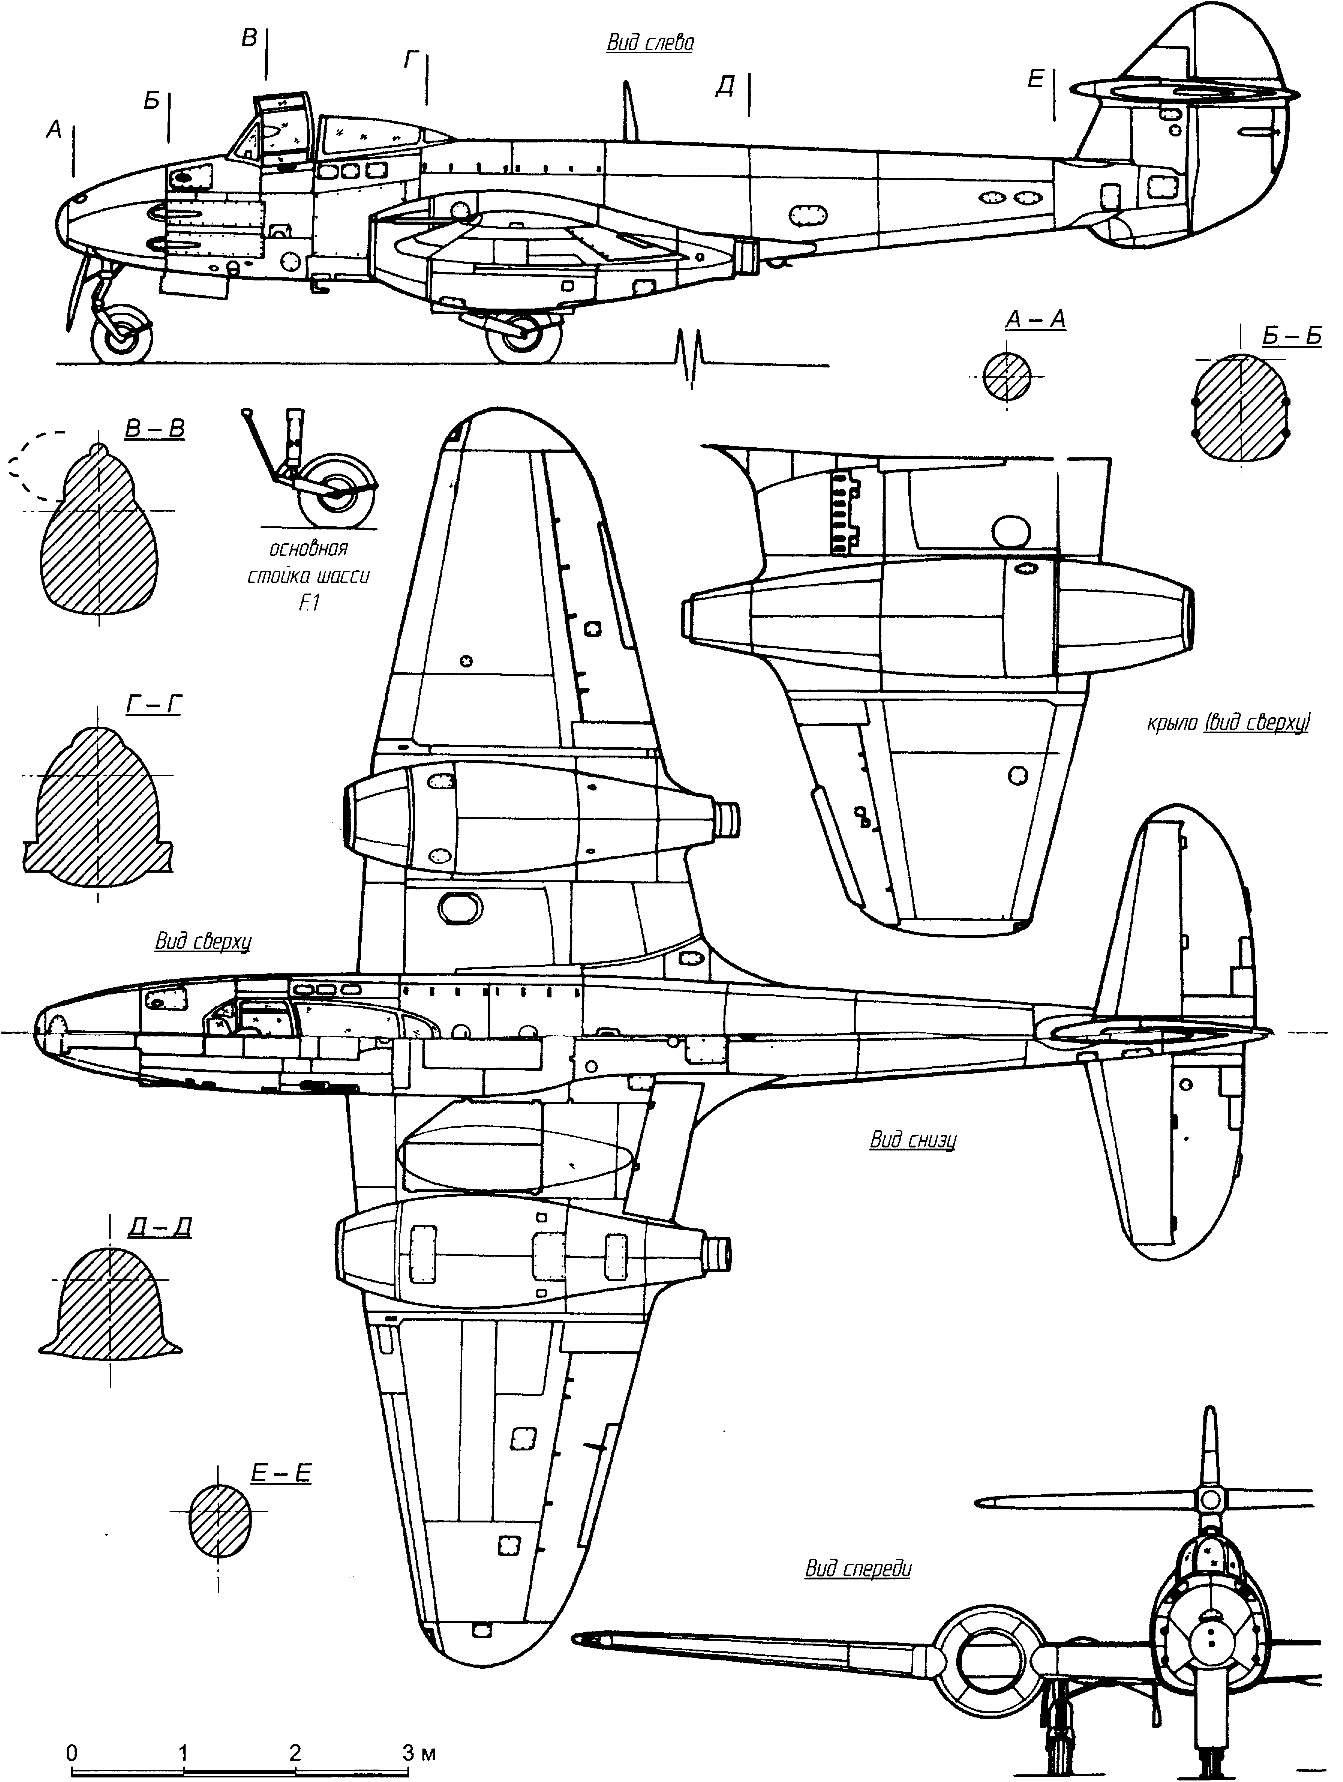 Meteor F.1